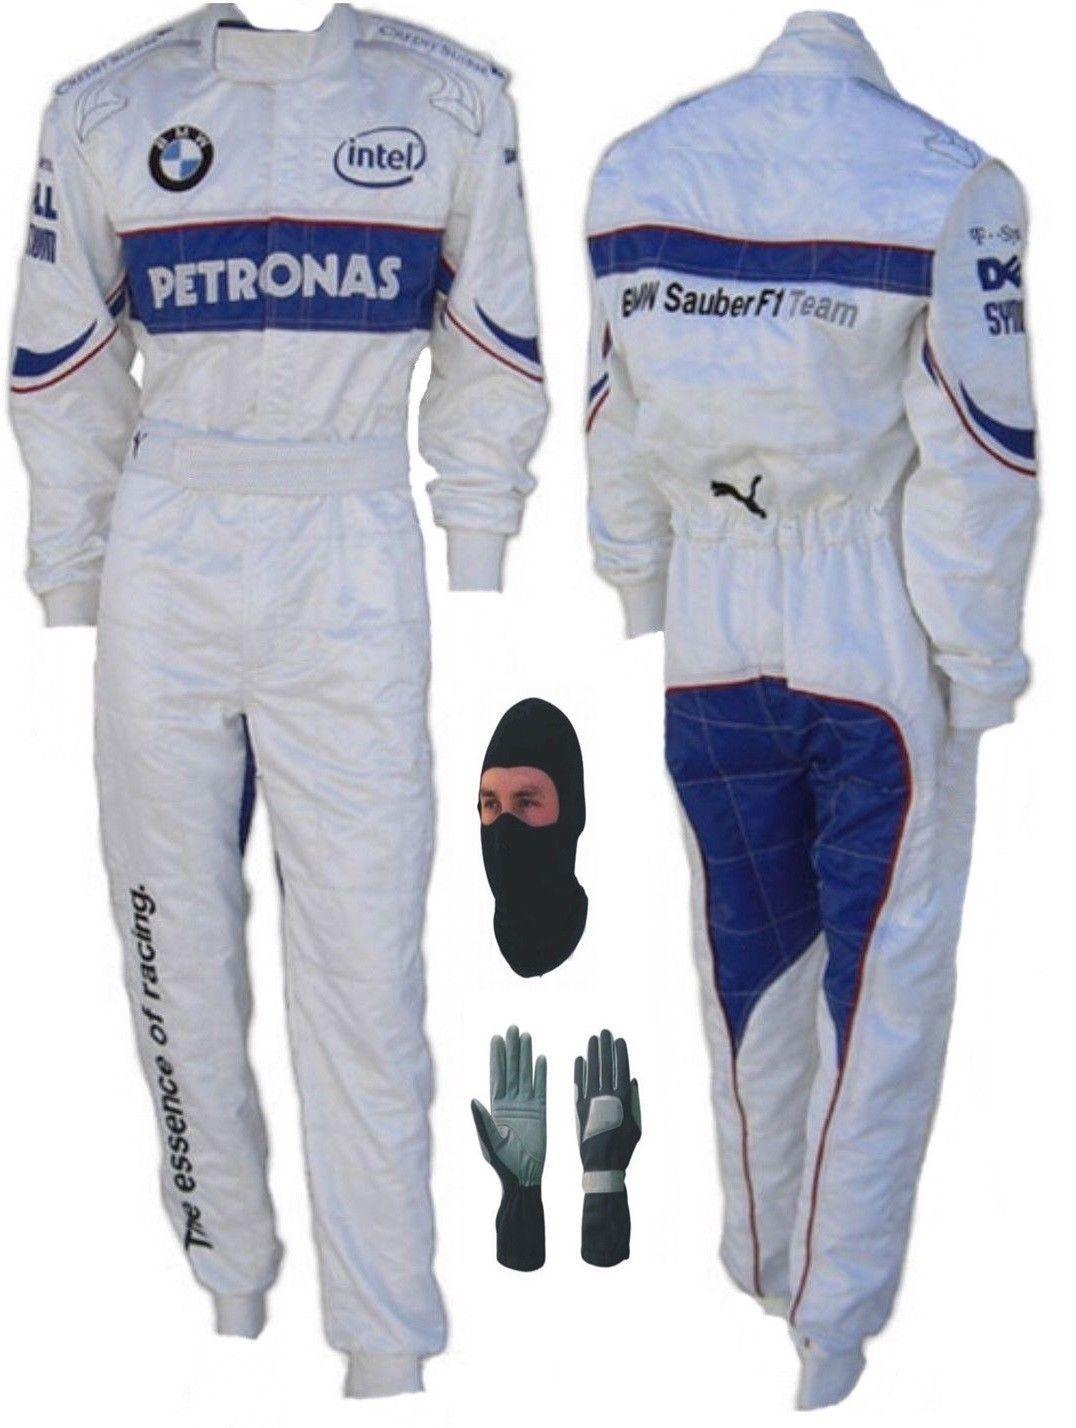 BMW petronas kart race CIK/FIA level 2 suit (free gifts)